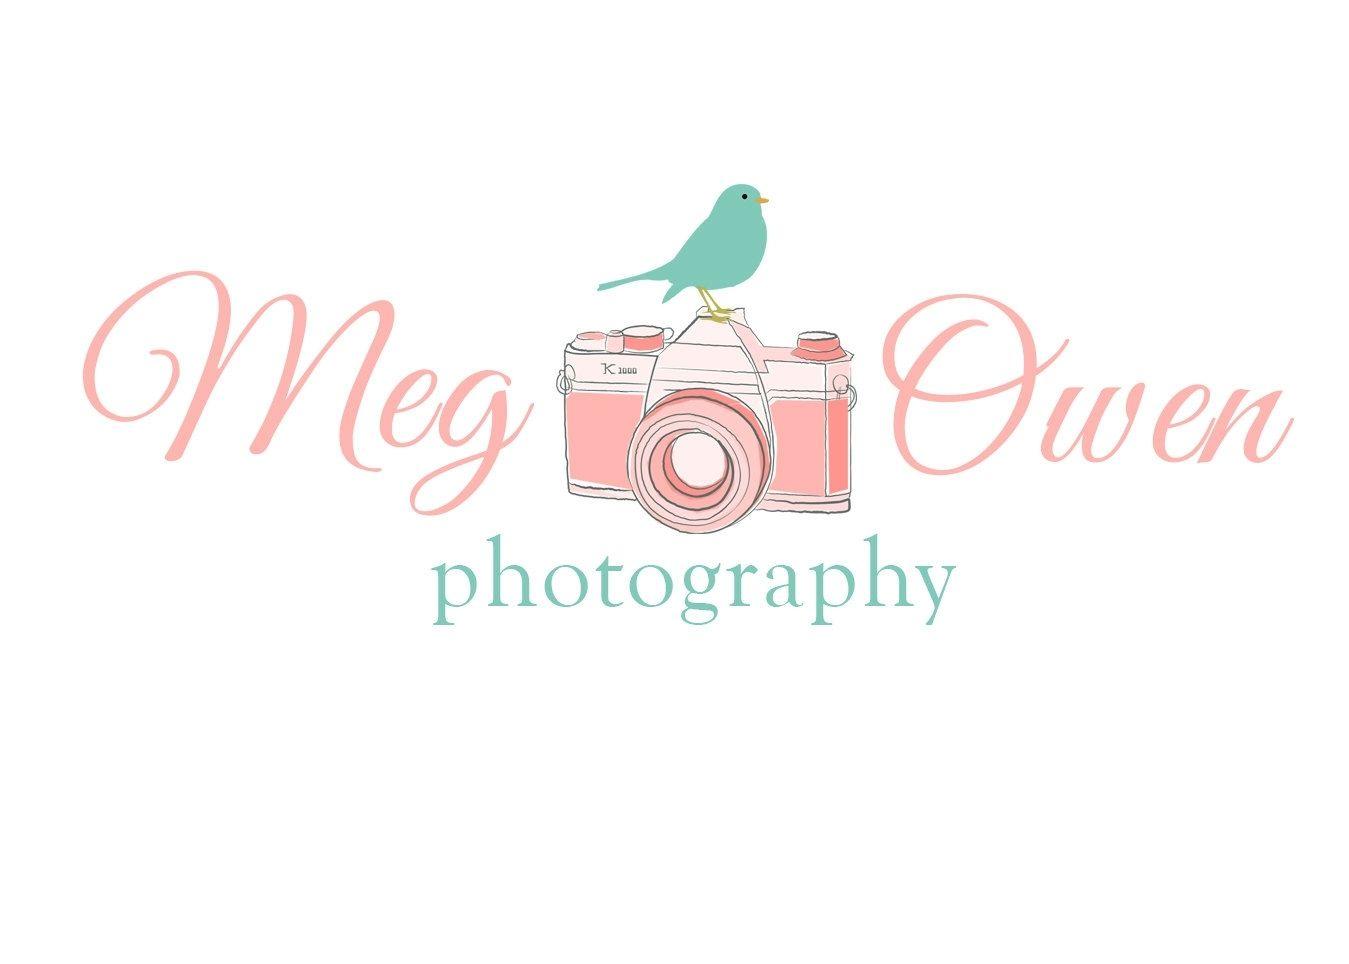 Photography Business Logo Ideas